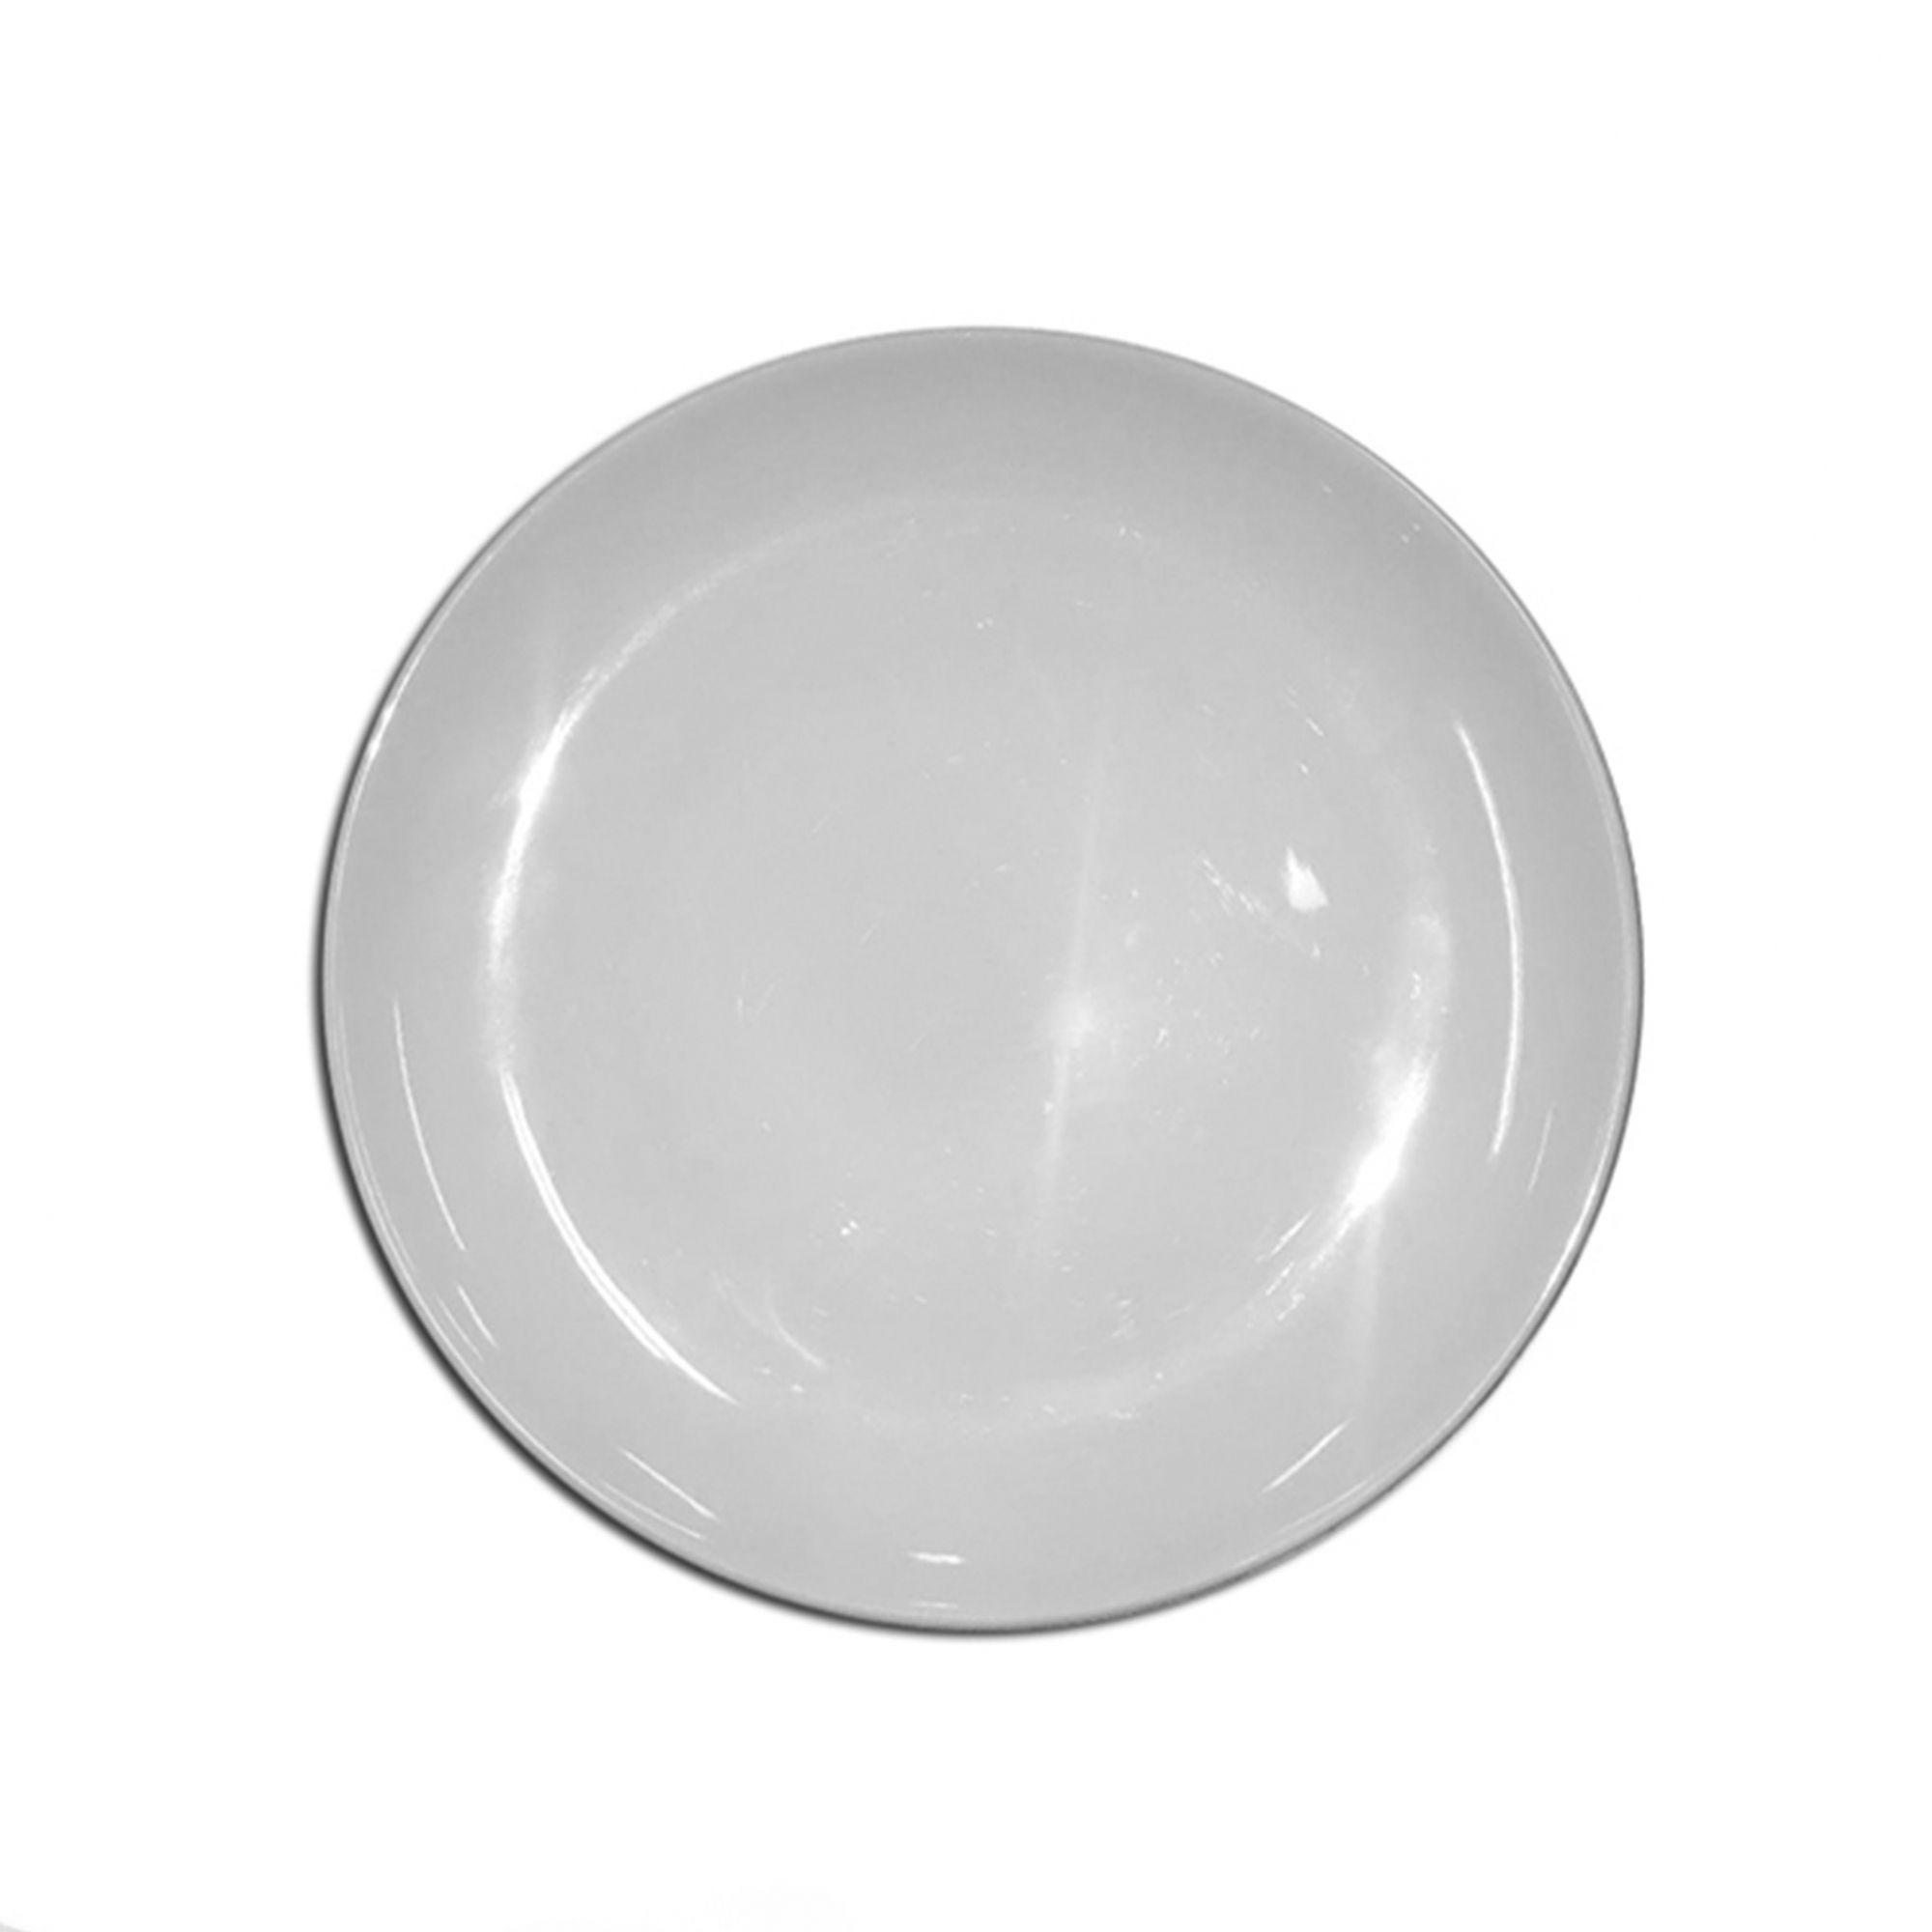 Prato Raso Branco 25,5 Cm Melamina Premium Buffet Festa